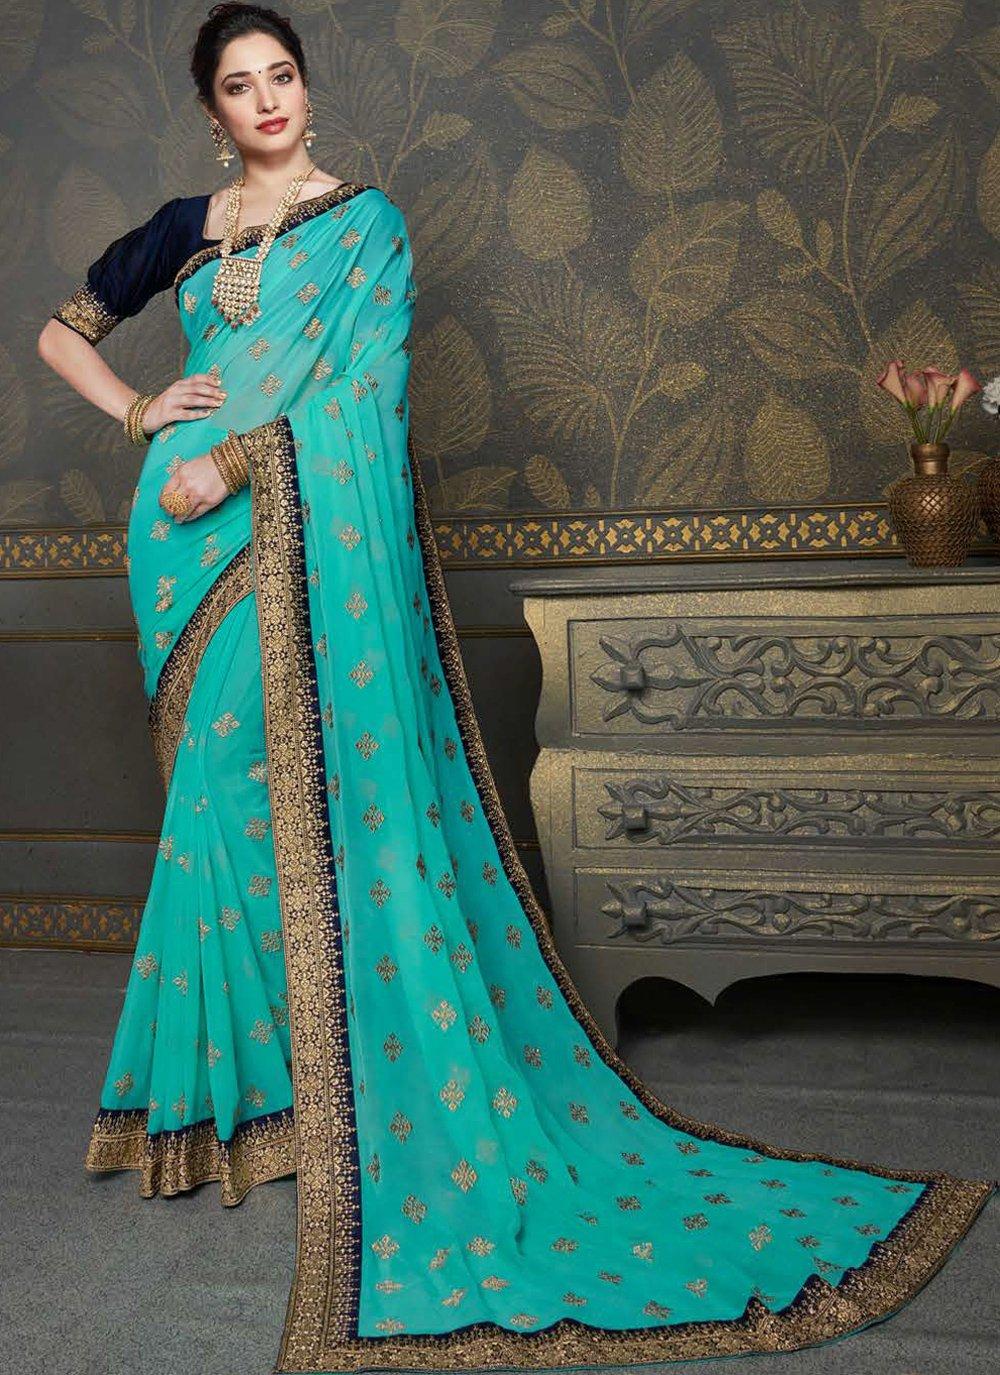 Embroidered Tamannaah Bhatia Faux Chiffon Classic Designer Saree